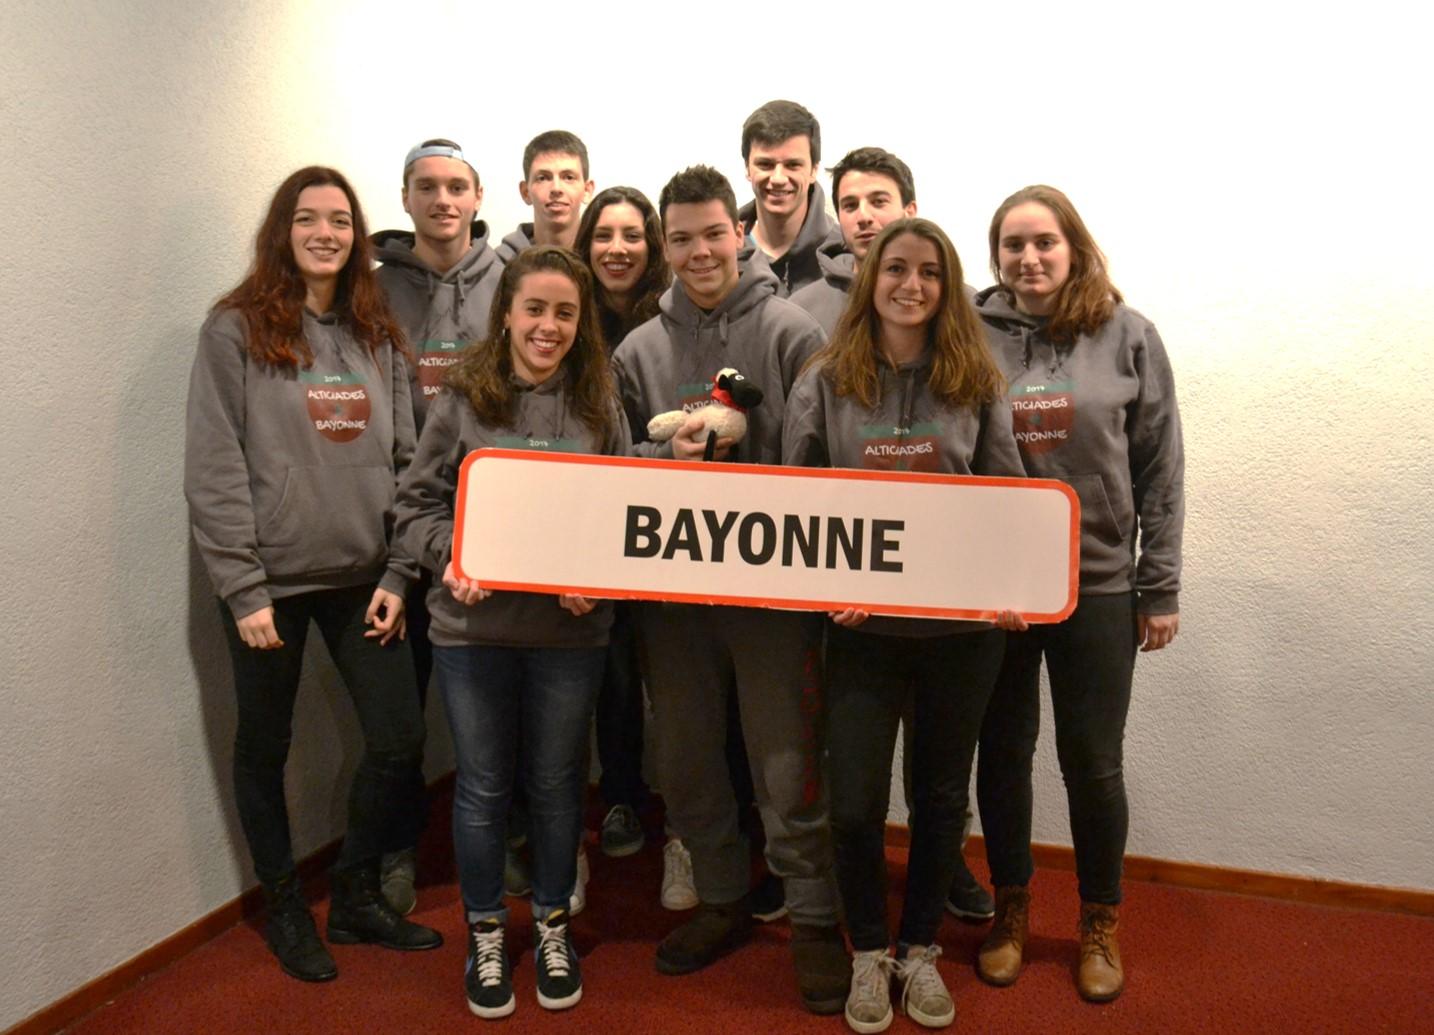 Tc2 Aliticades 2017 L Equipe De Bayonne Termine 6eme Au Classement